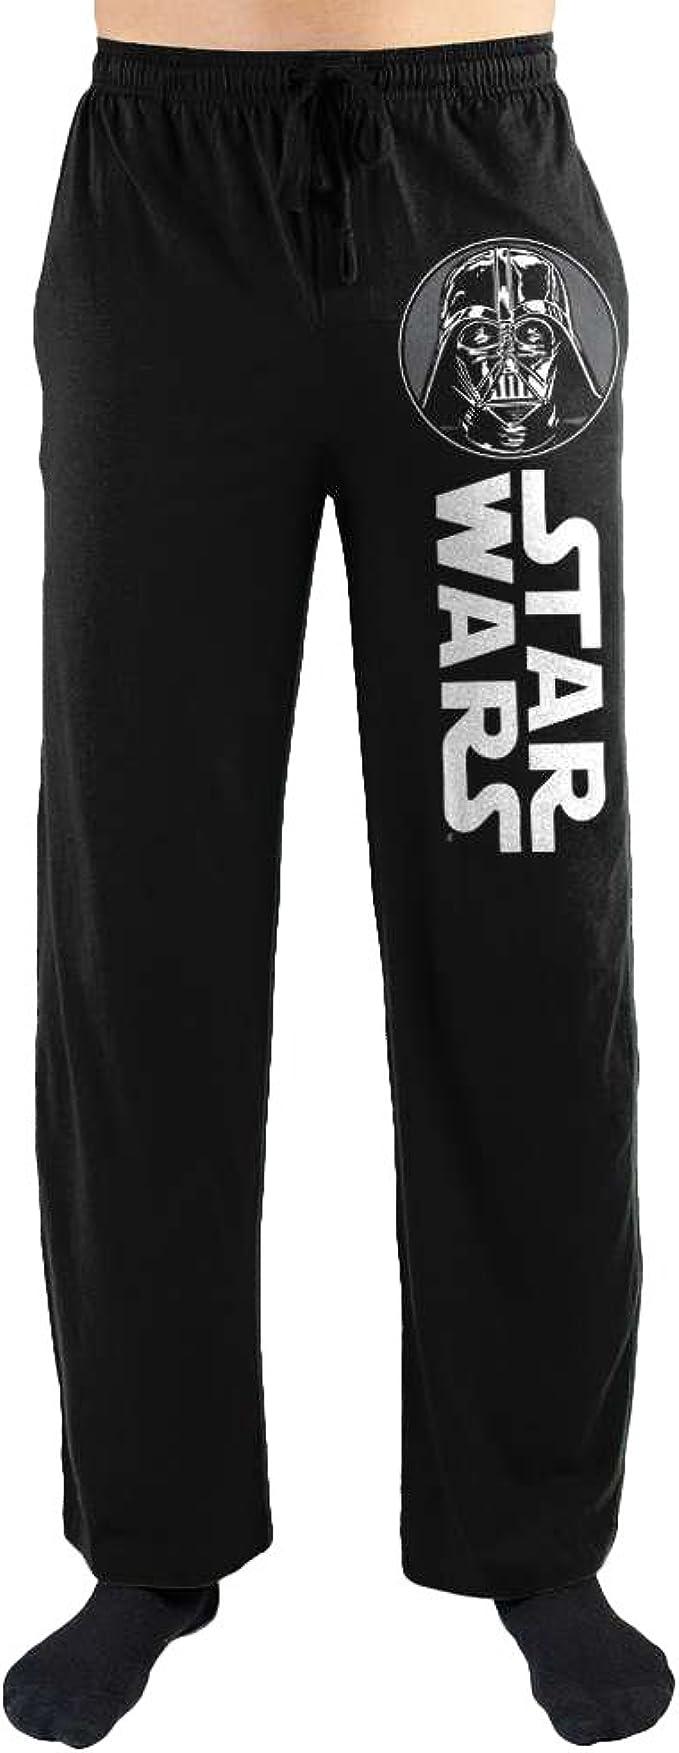 Mens Star Wars PjsStar Wars Lounge PantsDarth Vader PyjamasJedi Pjs